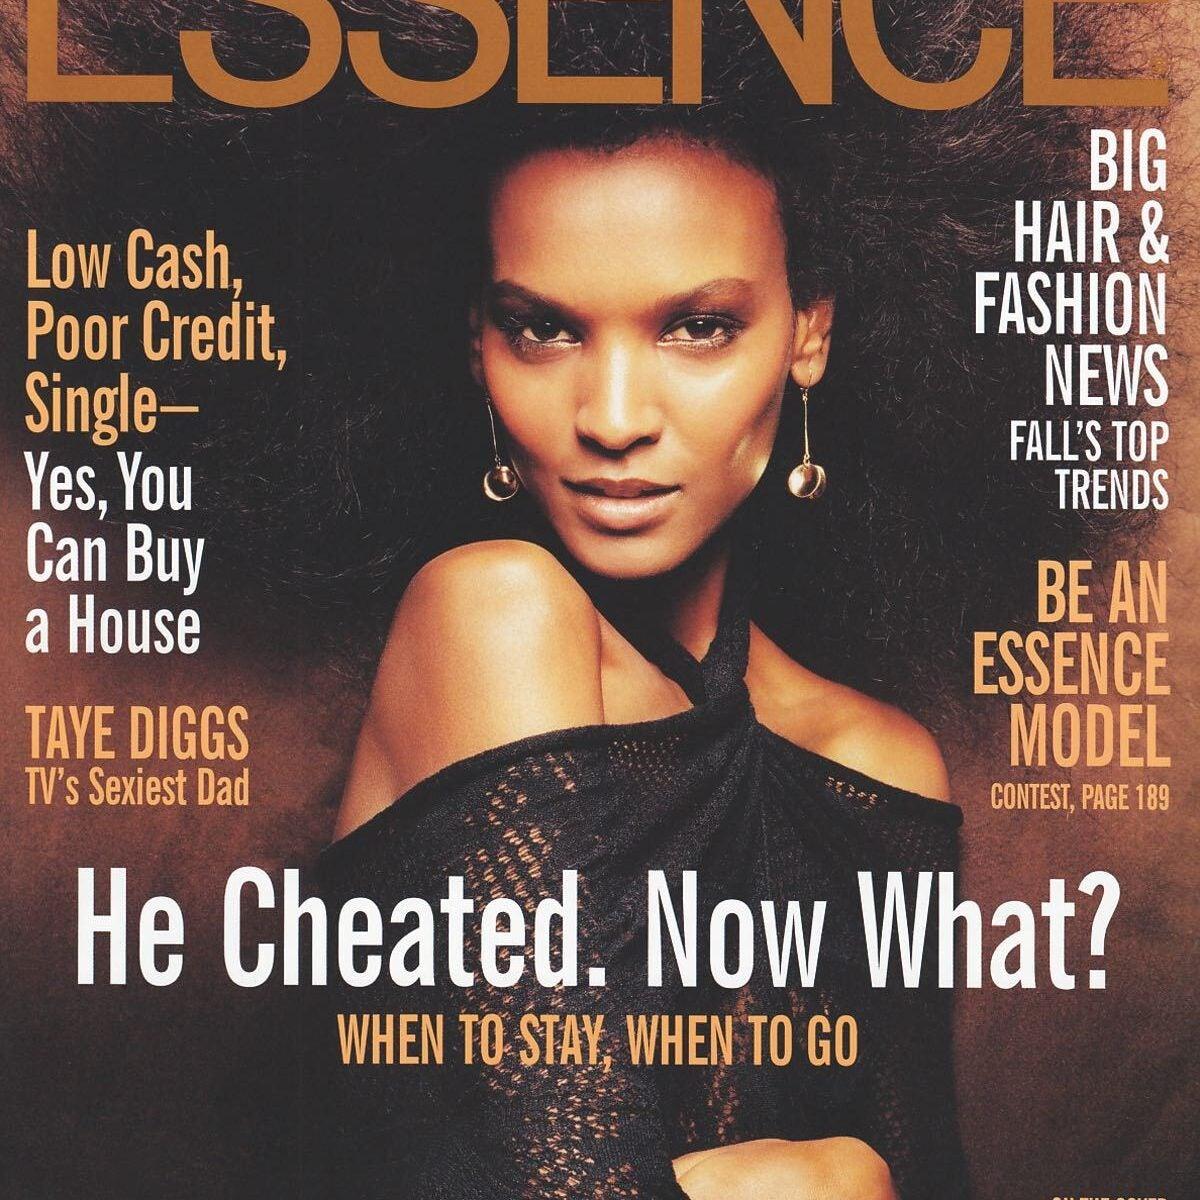 TWENTY: Iconic Black Models We All Should Know